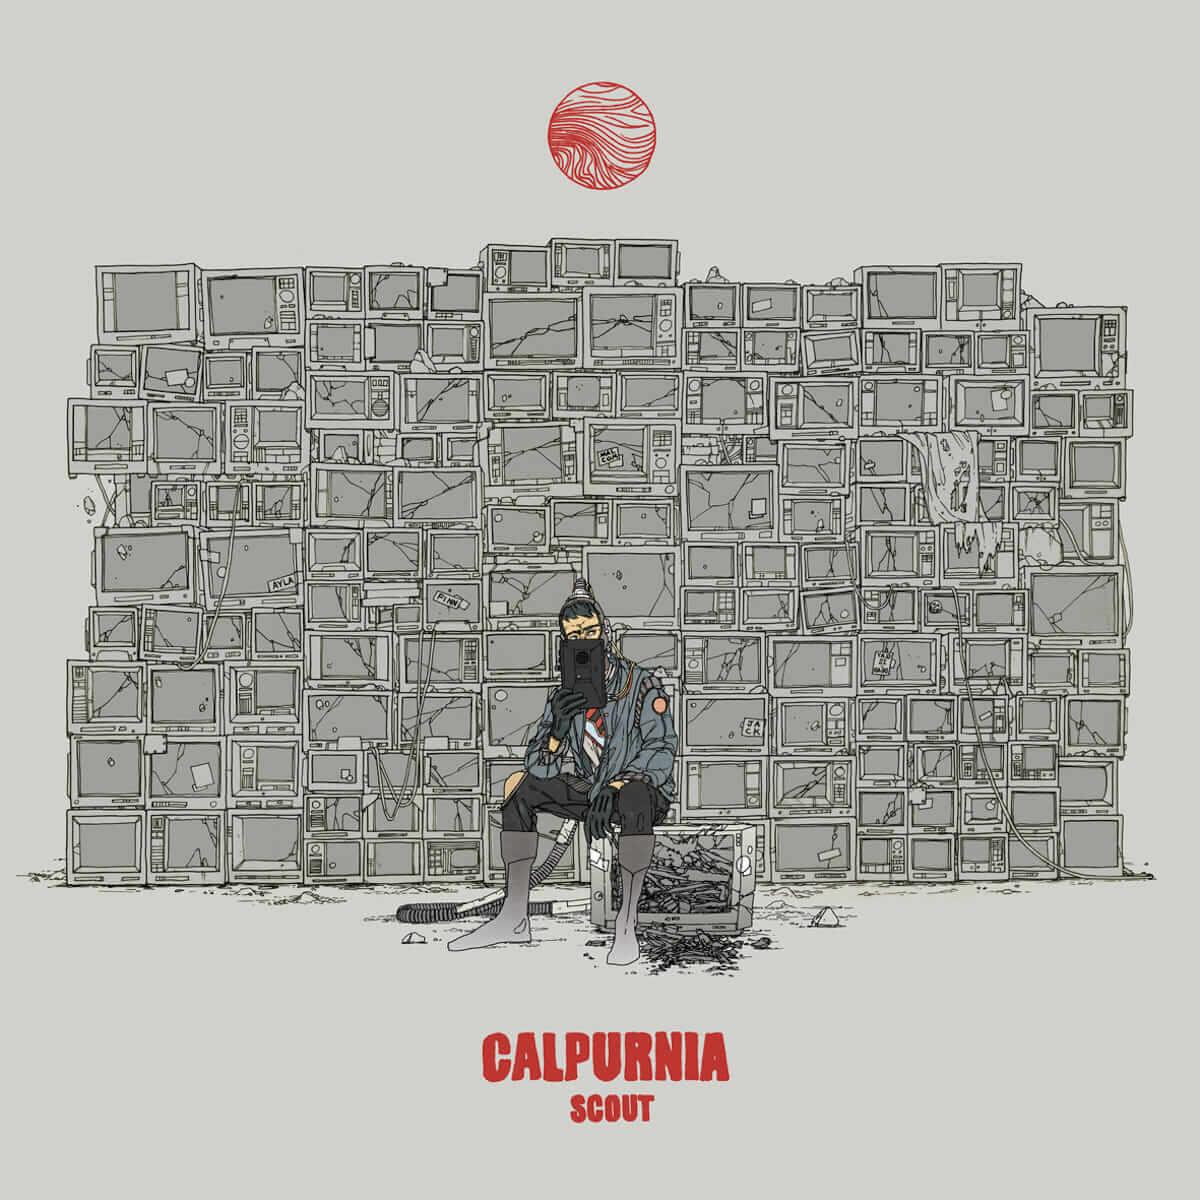 Netflix『ストレンジャー・シングス』出演フィン・ヴォルフハルト率いるバンド、カルプルニア、来日公演開催決定!! music180717_calpurniatheband_03-1200x1200